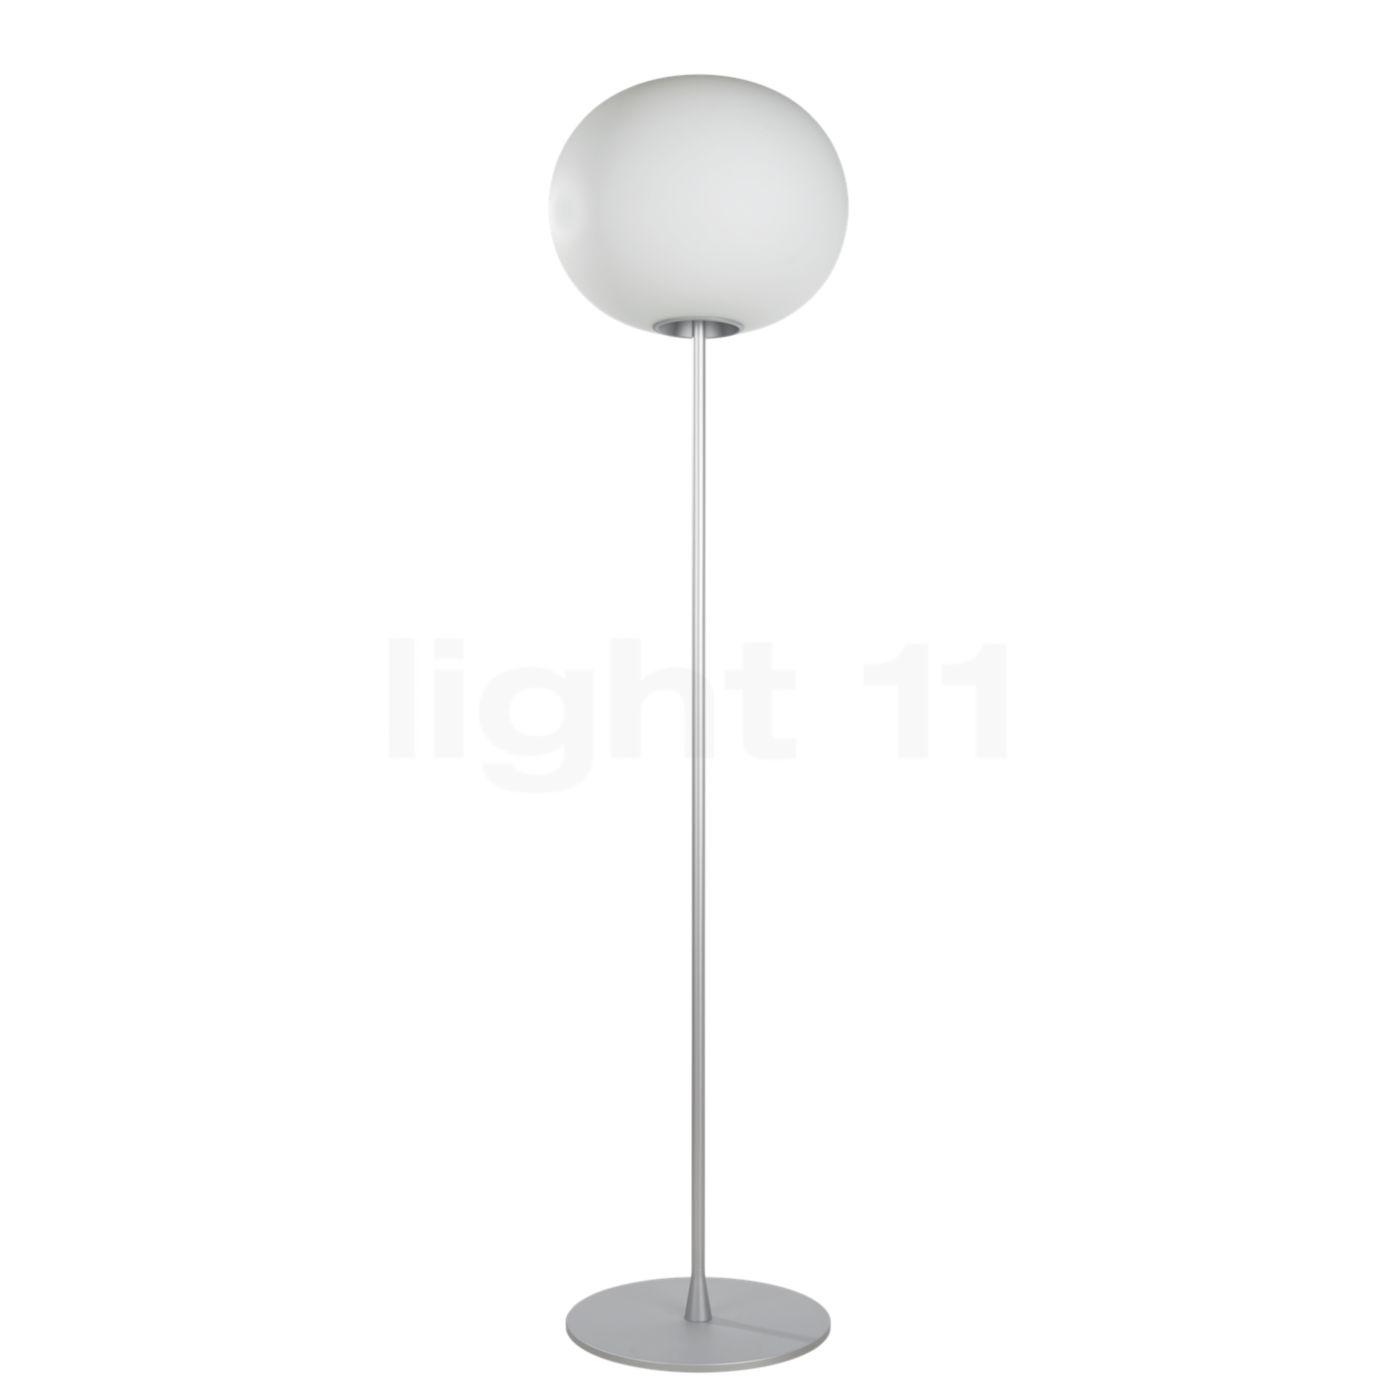 Flos-Glo-Ball-F3--2000080100001_1_p Elegantes Flos Glo Ball S Dekorationen